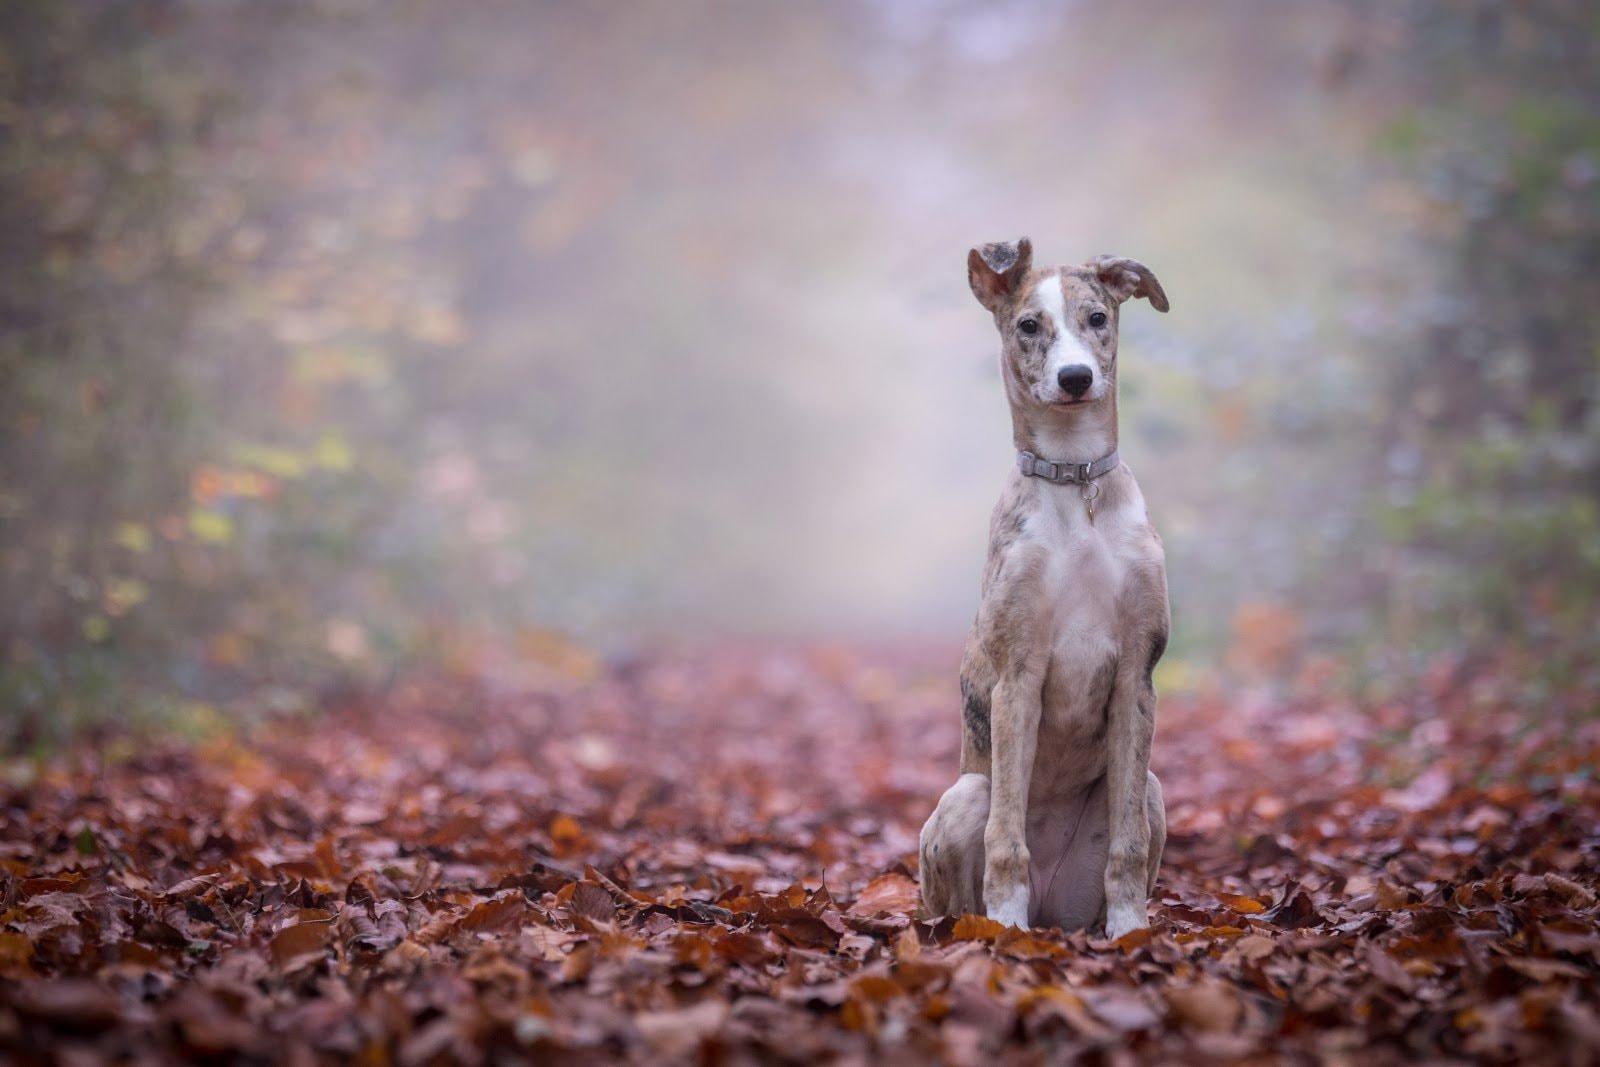 Dog standing amongst autumn leaves by Ben Hanson